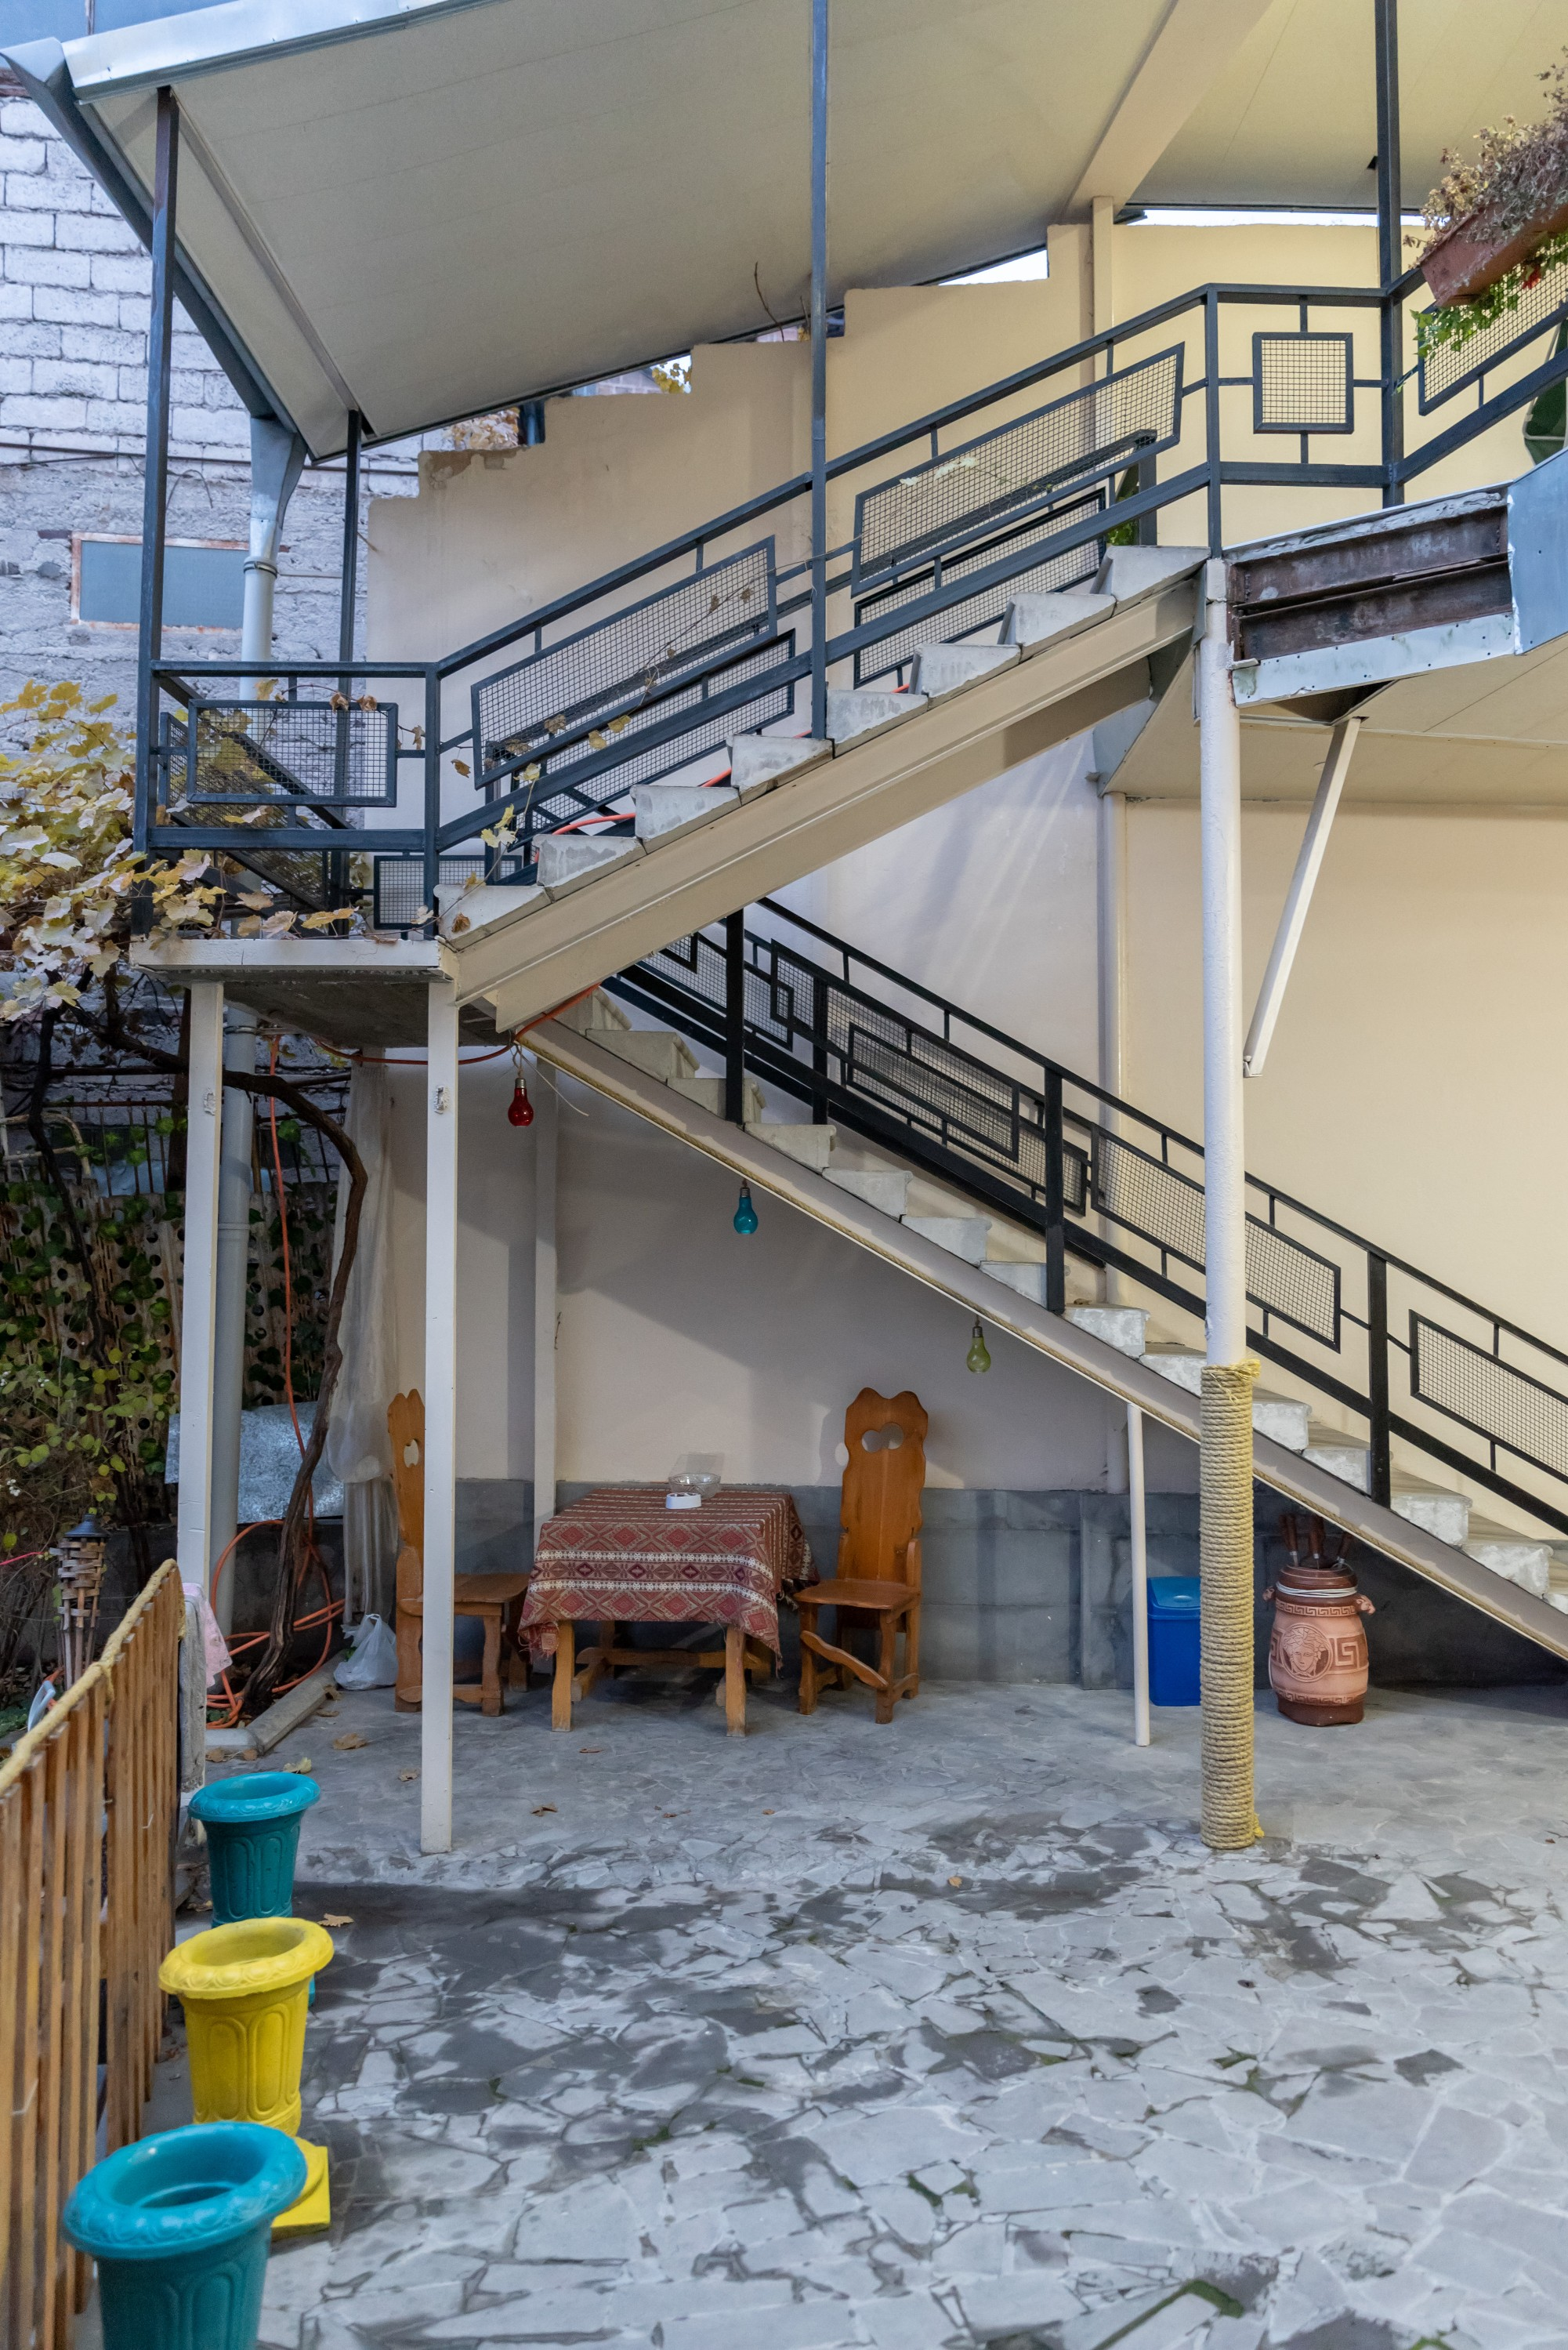 ArtEast Hostel